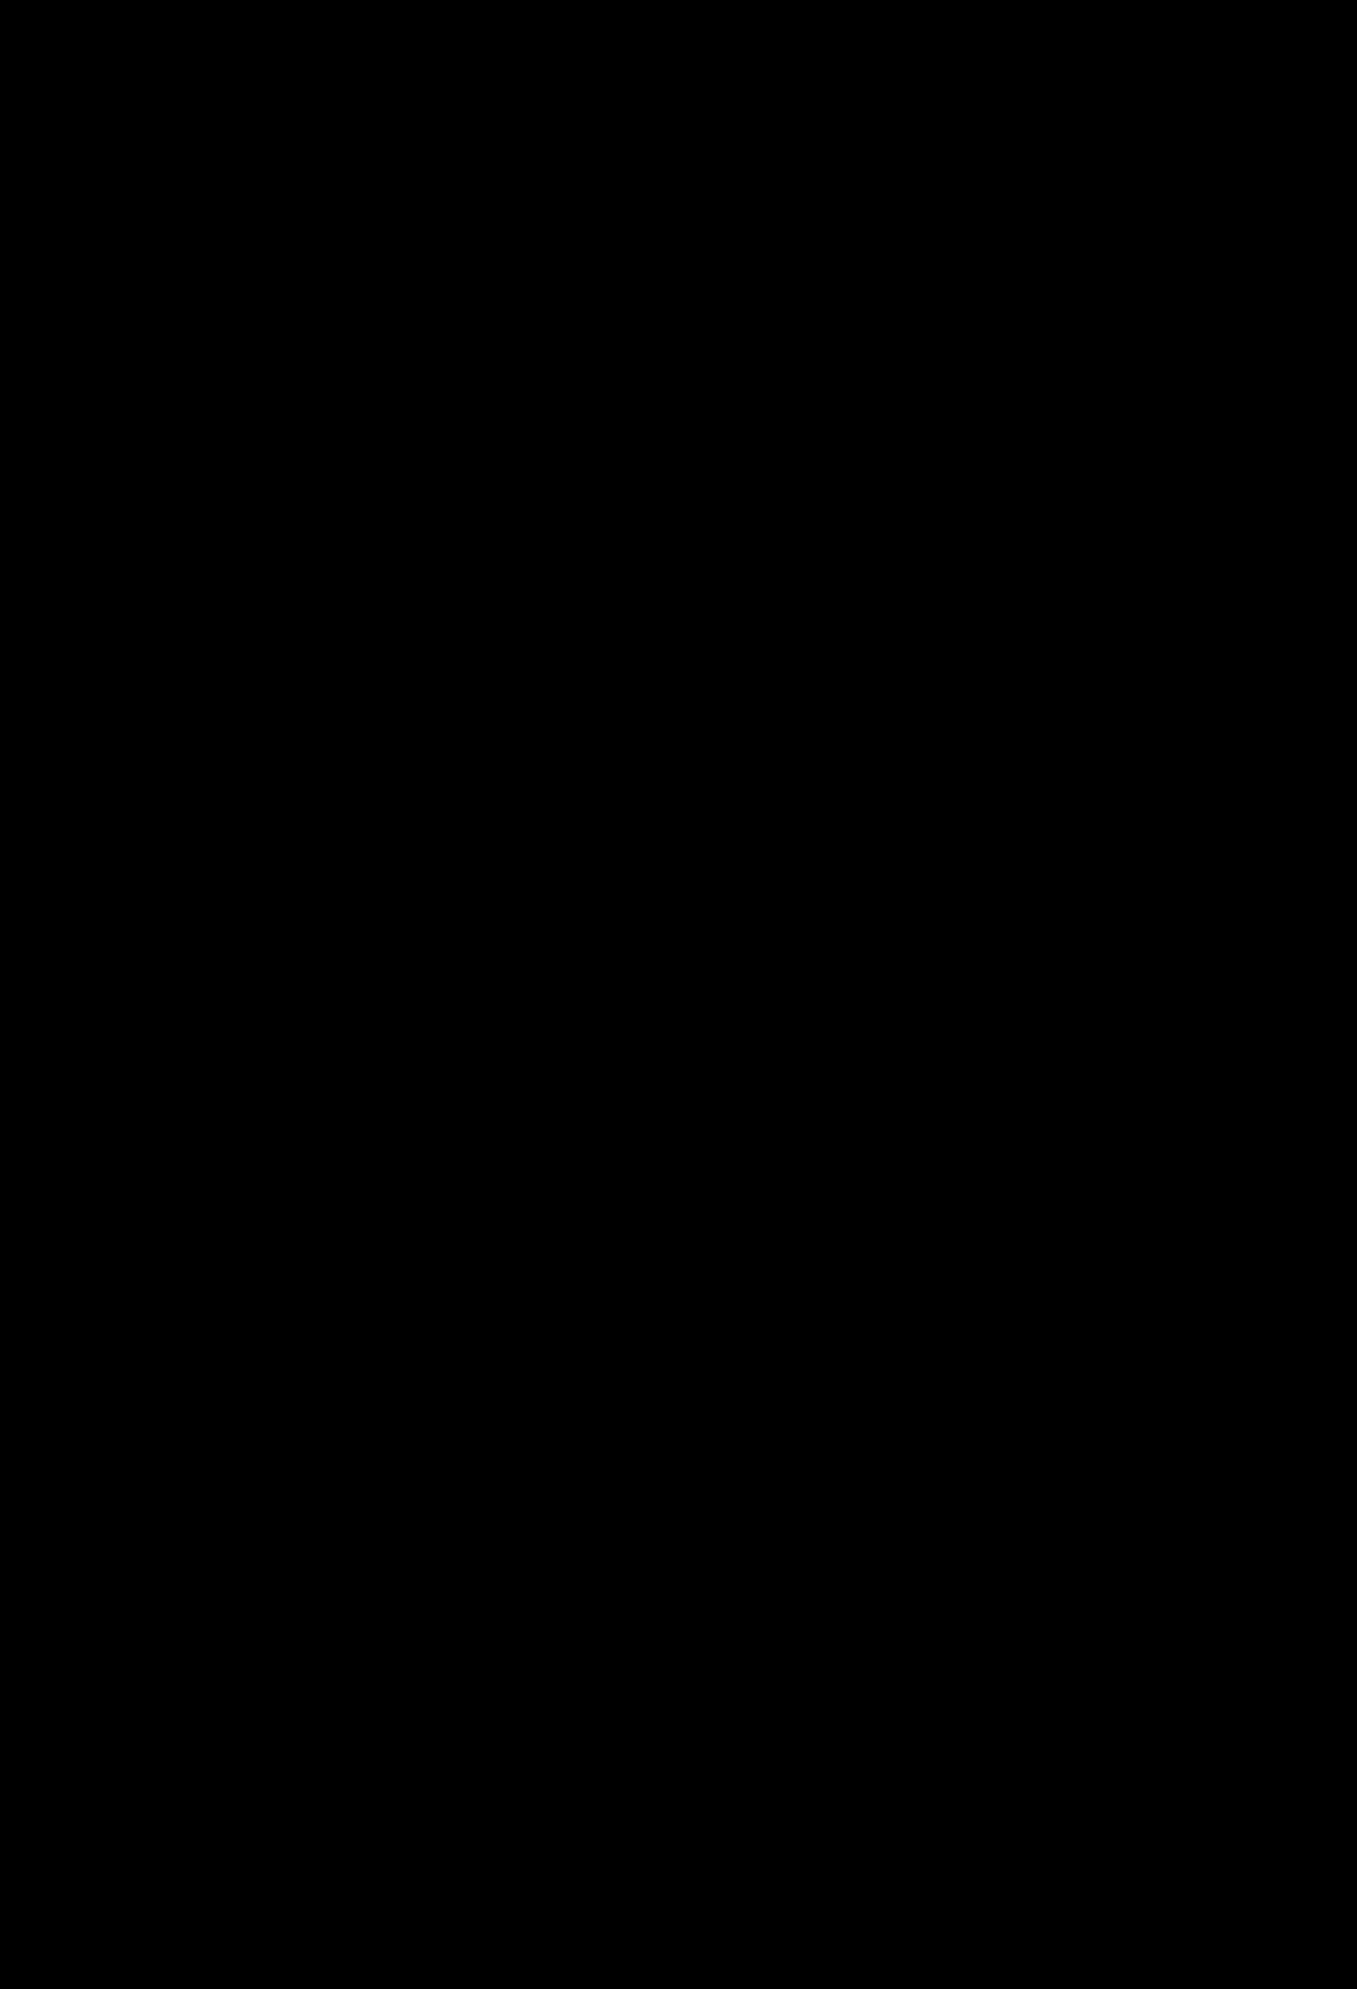 1357x1989 Clipart